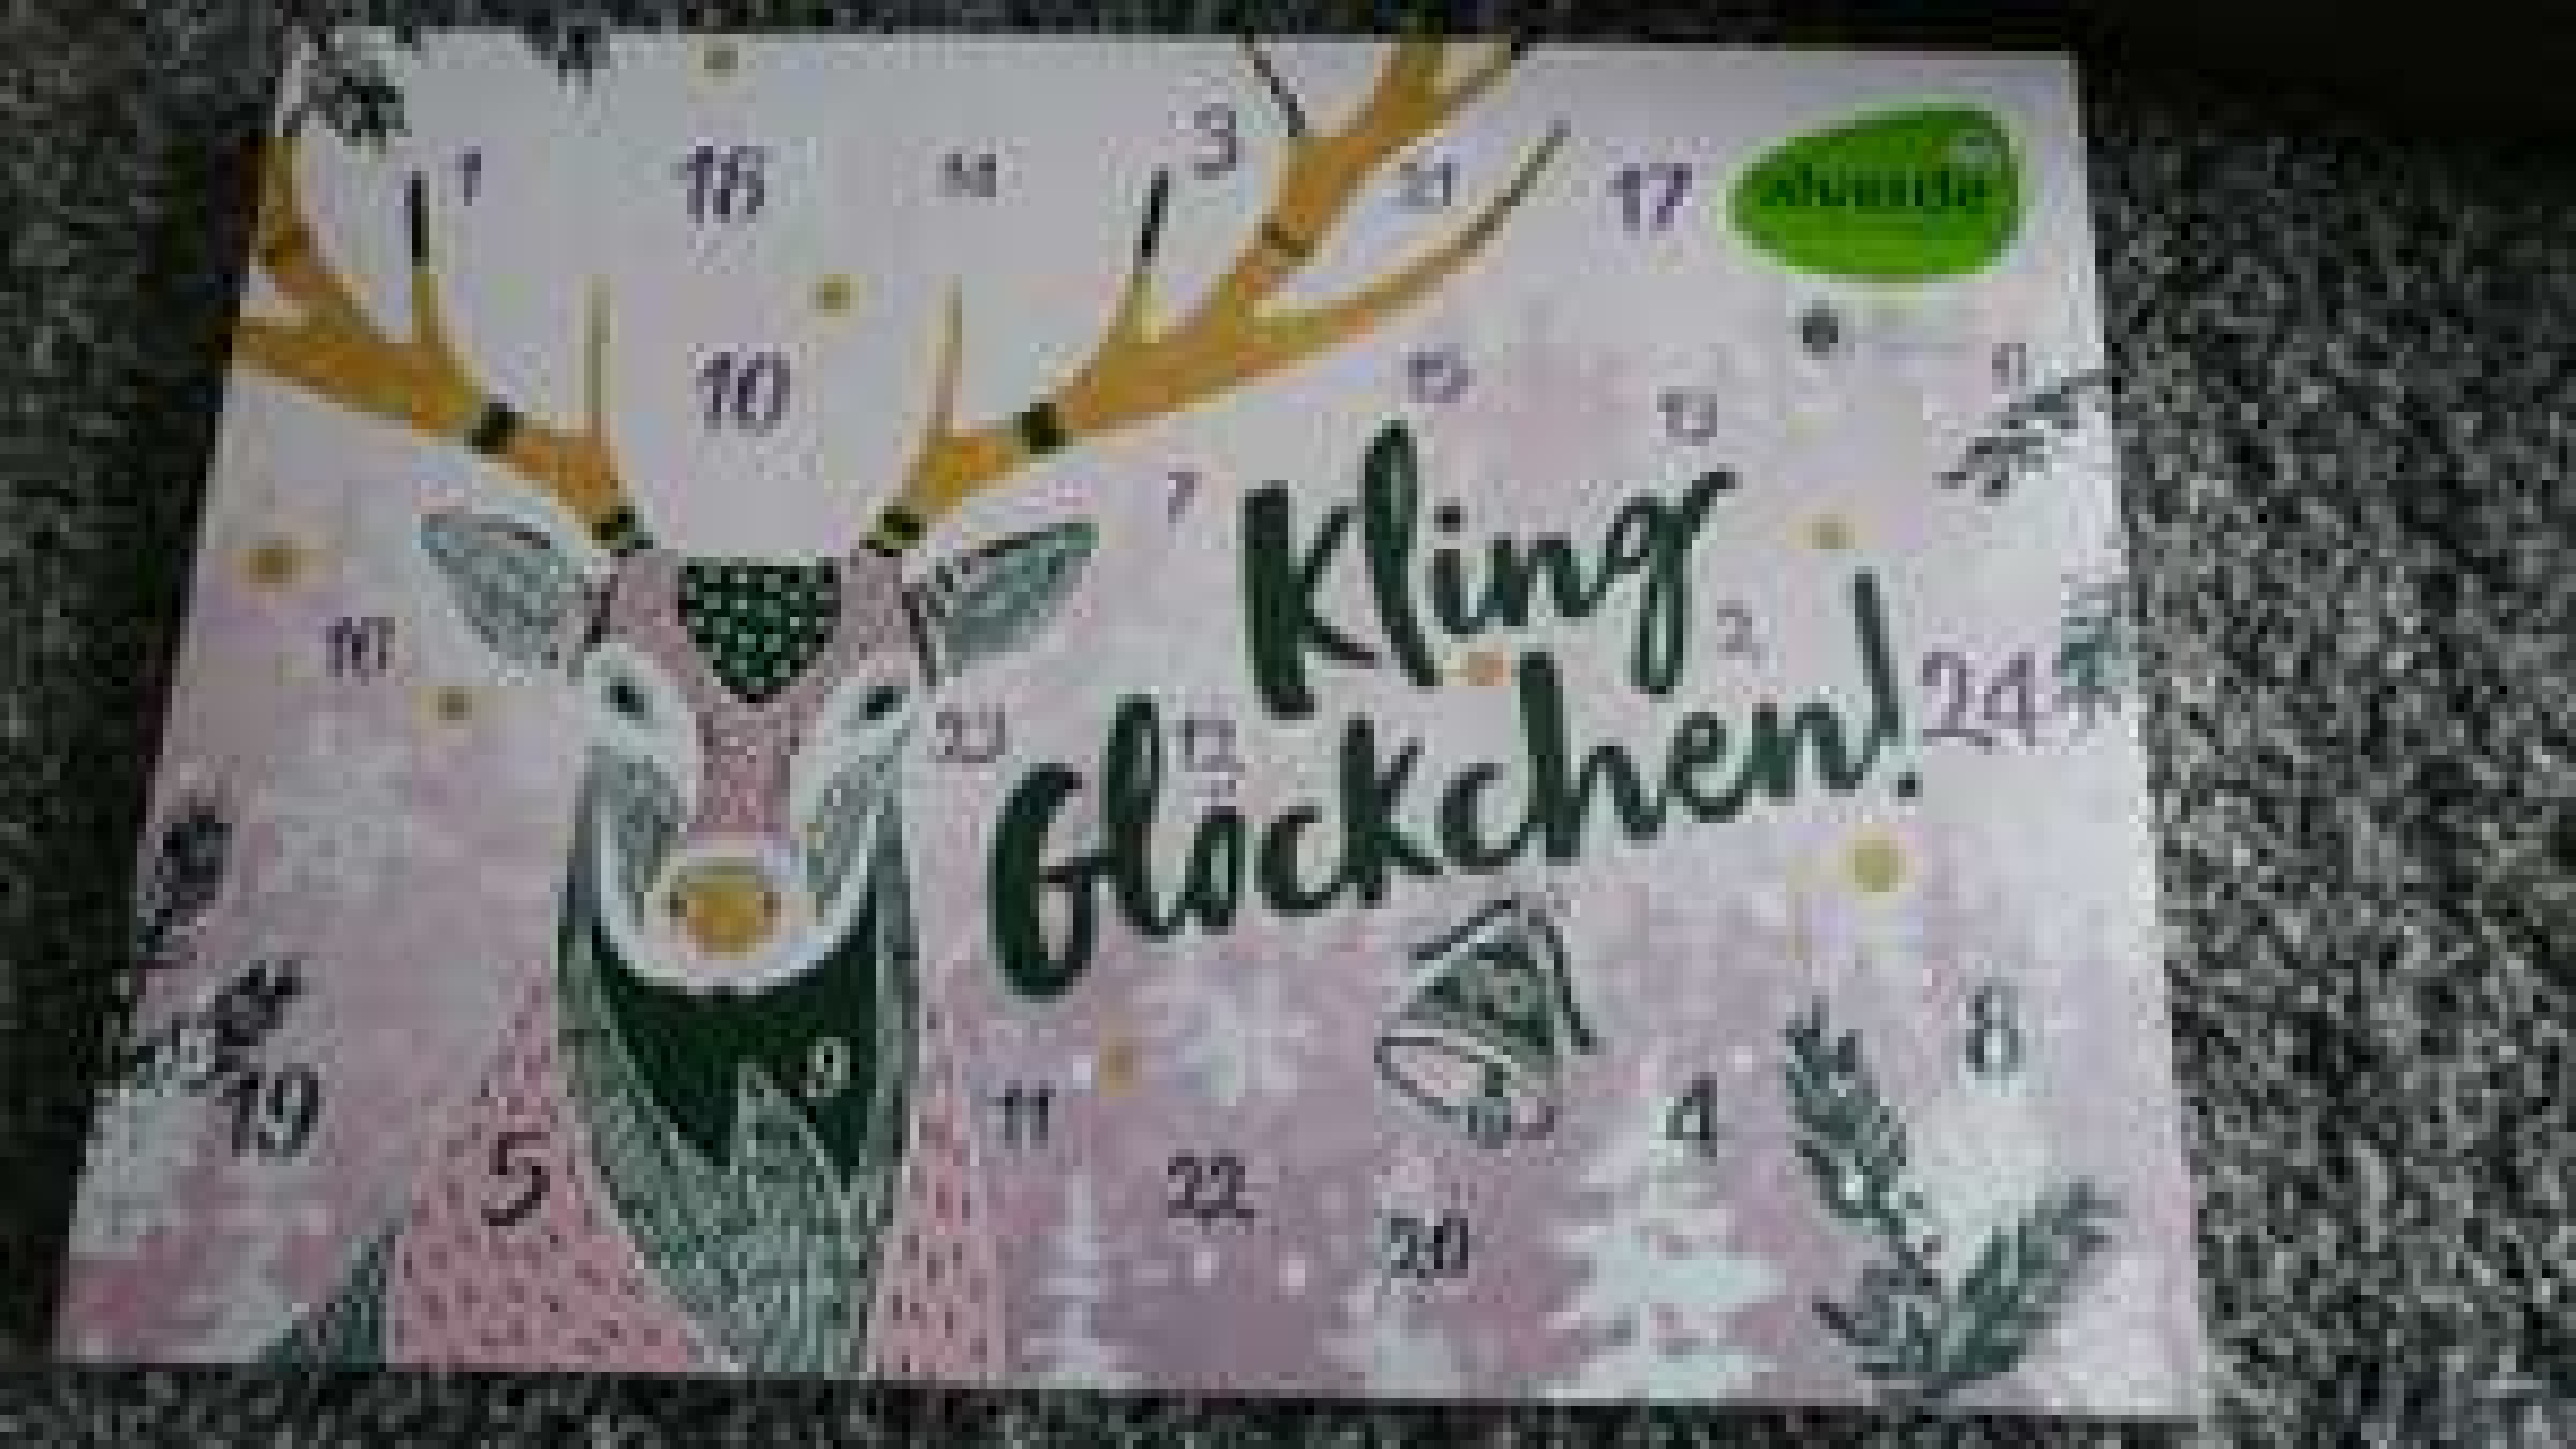 dm Amberg - Diverse Adventskalender reduziert - Alverde 10€/Saubär 6€